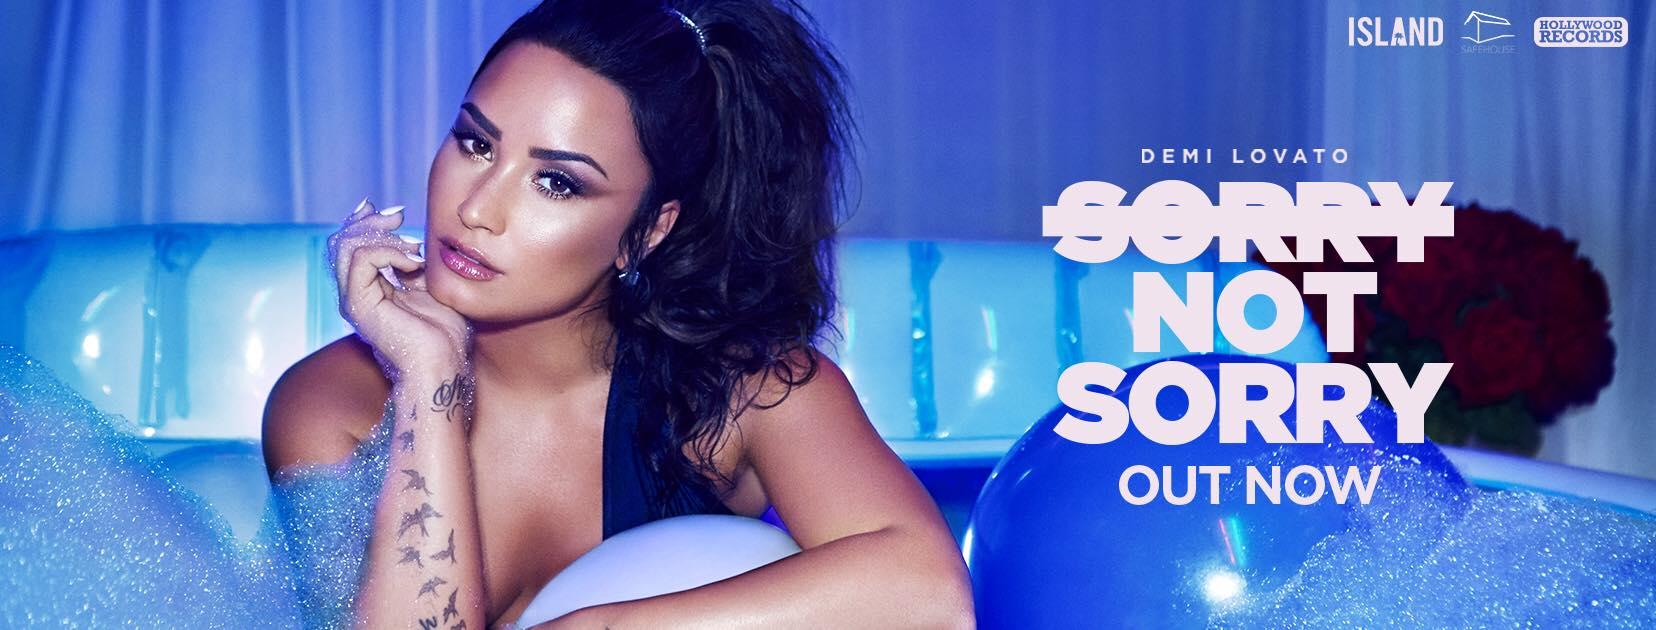 Demi Lovato JustMusic.fr